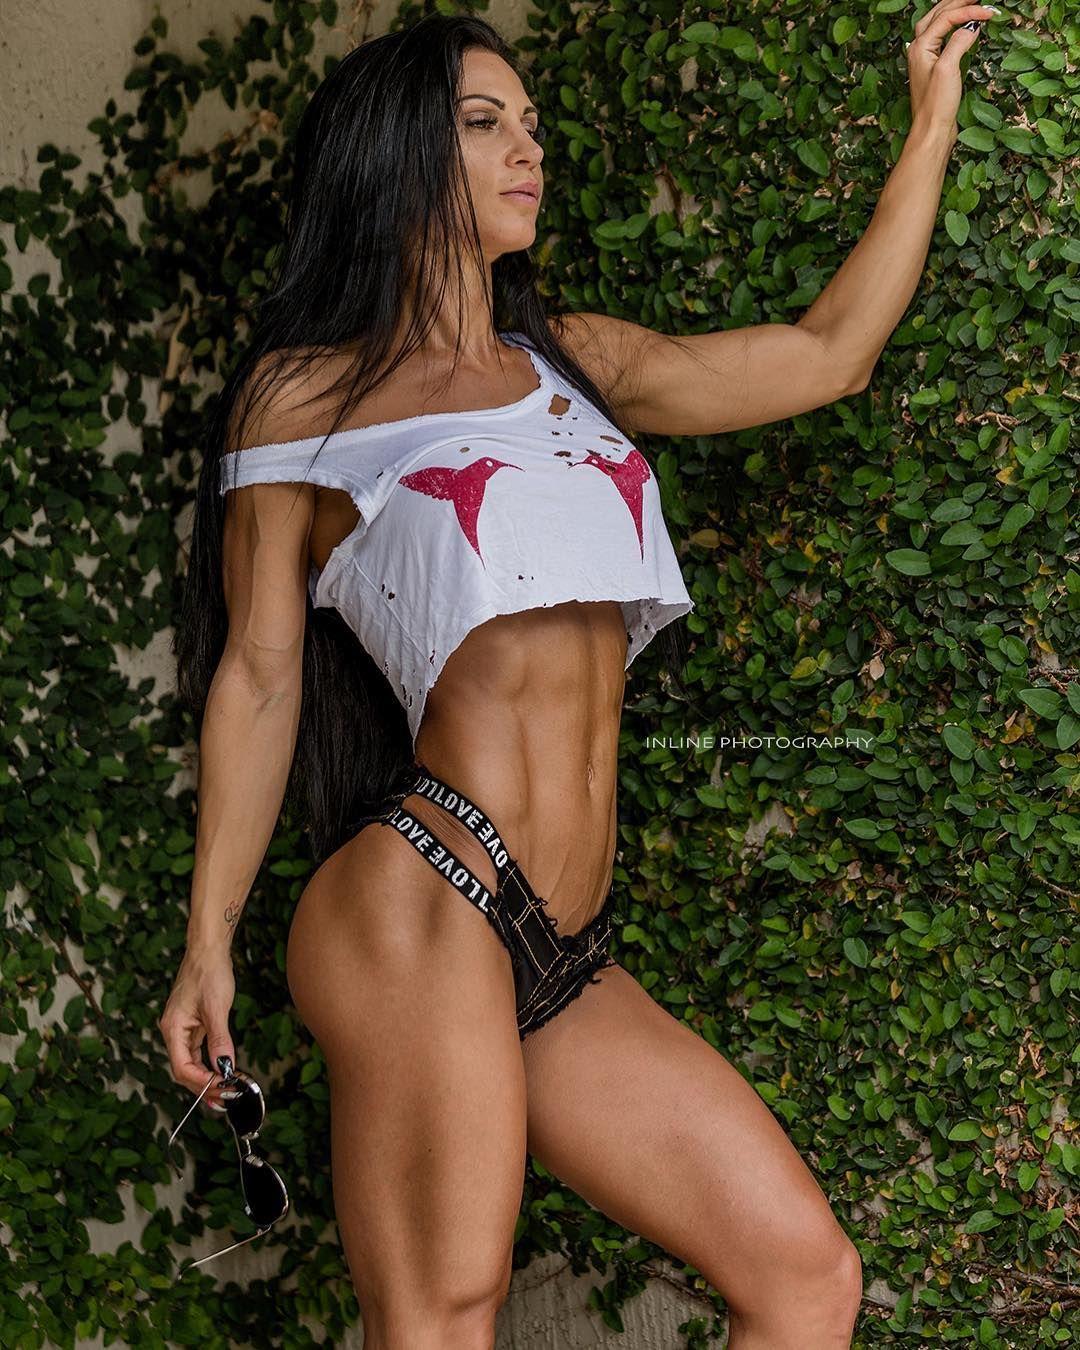 Anita herbert - greatest physiques